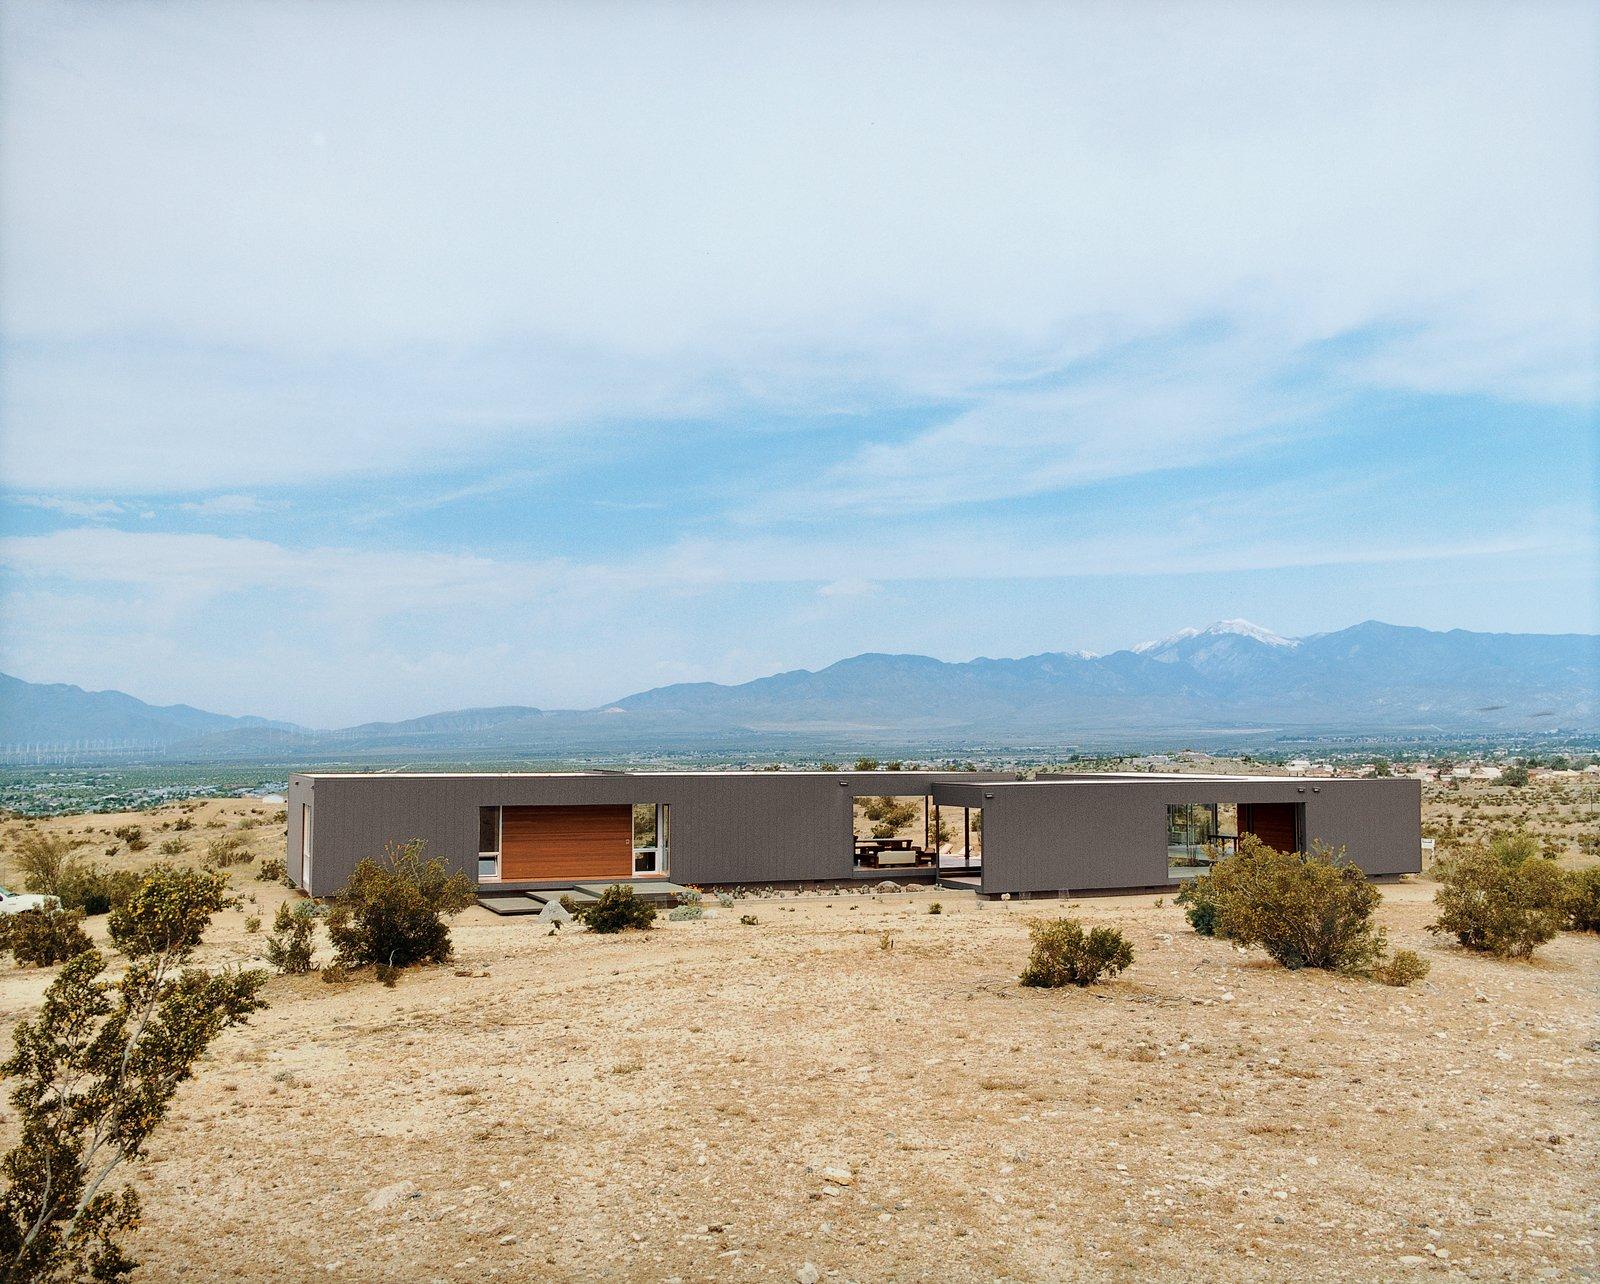 #desertutopia #desert #marmolradziner #marmol #radzinner #prefab #exterior #modernarchitecture  Photo 10 of 23 in 20 Desert Homes from modern homes